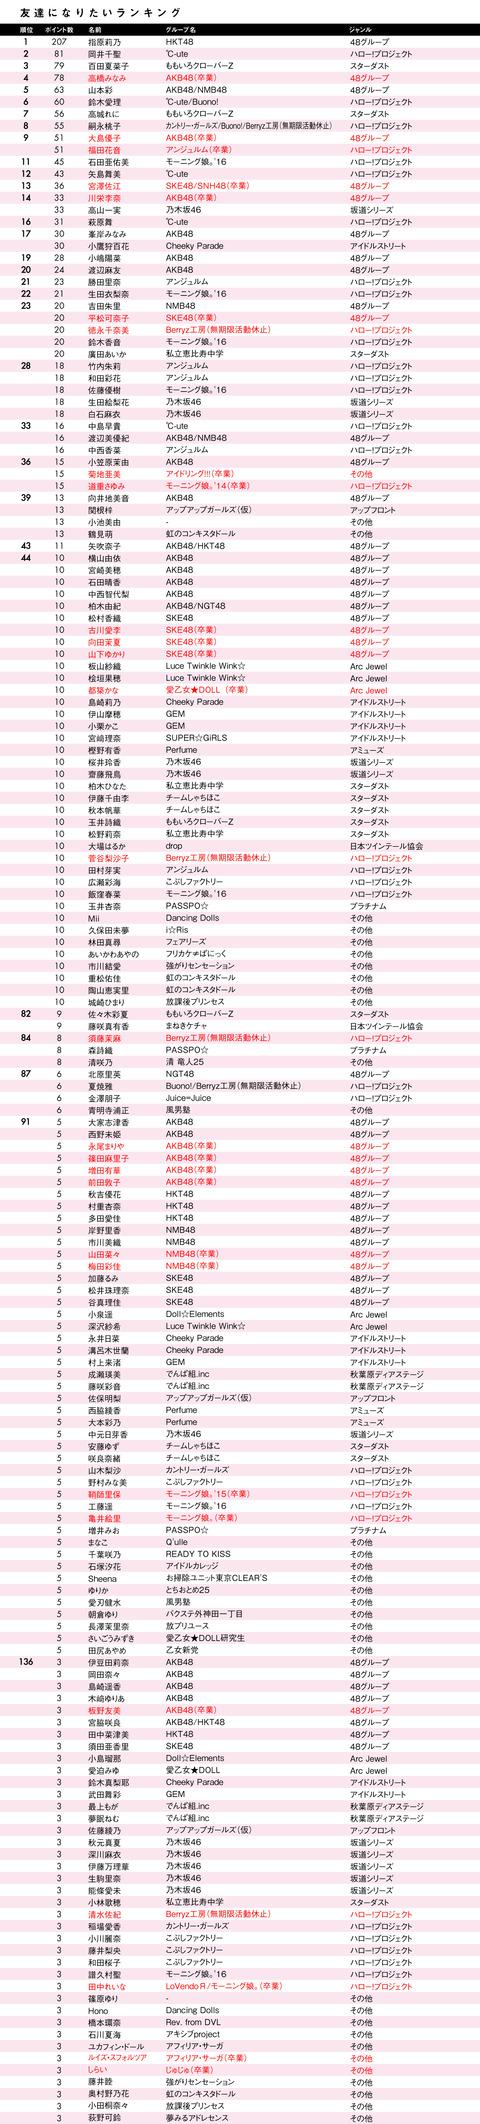 unidol_column07_02_2